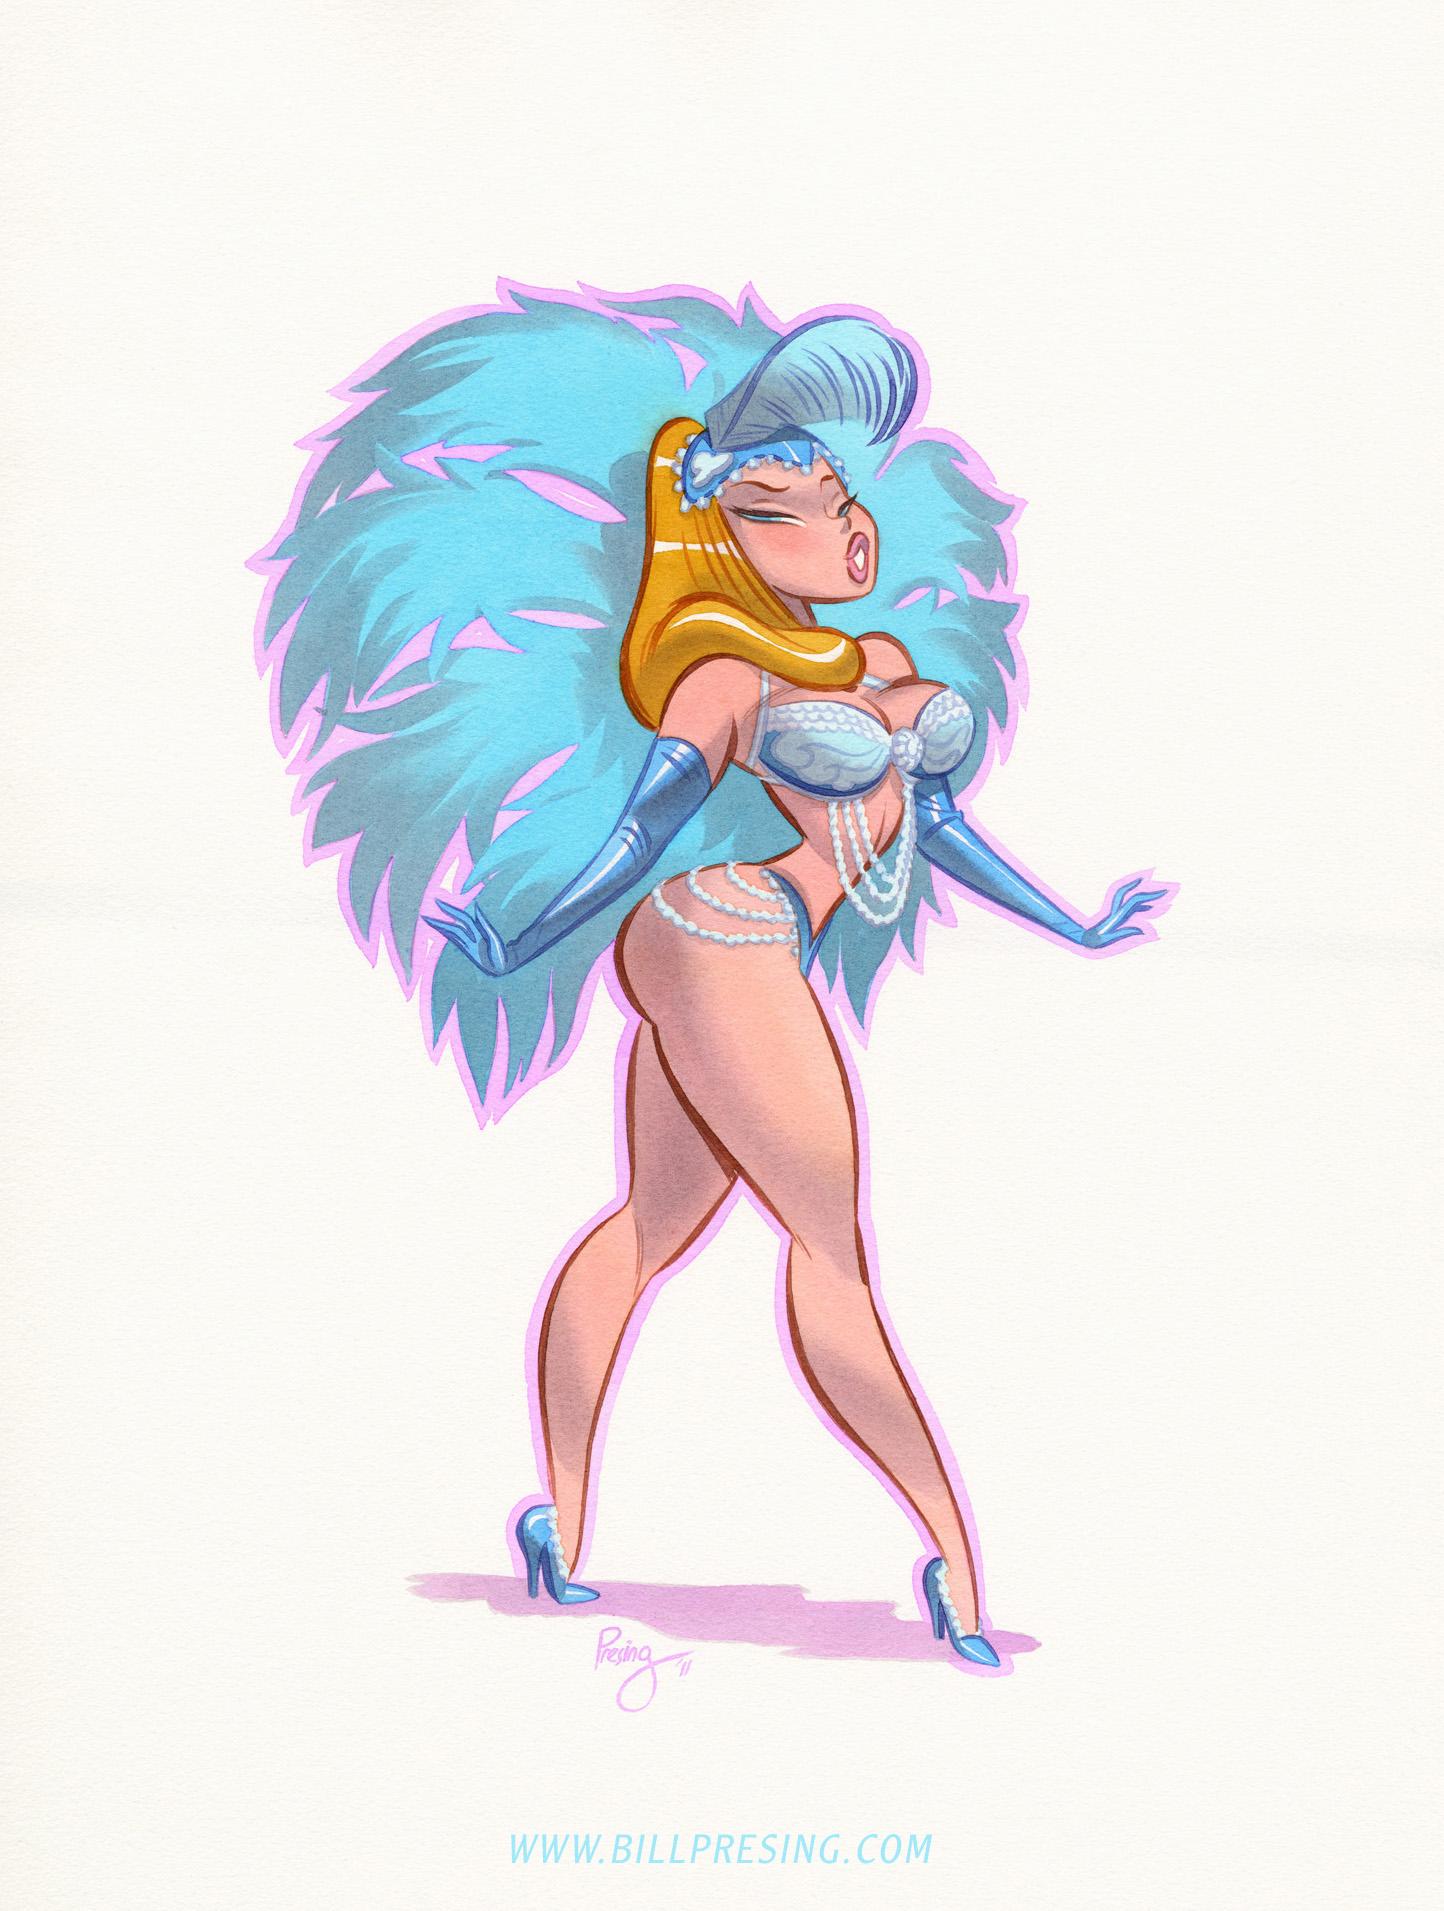 Showgirl by bpresing